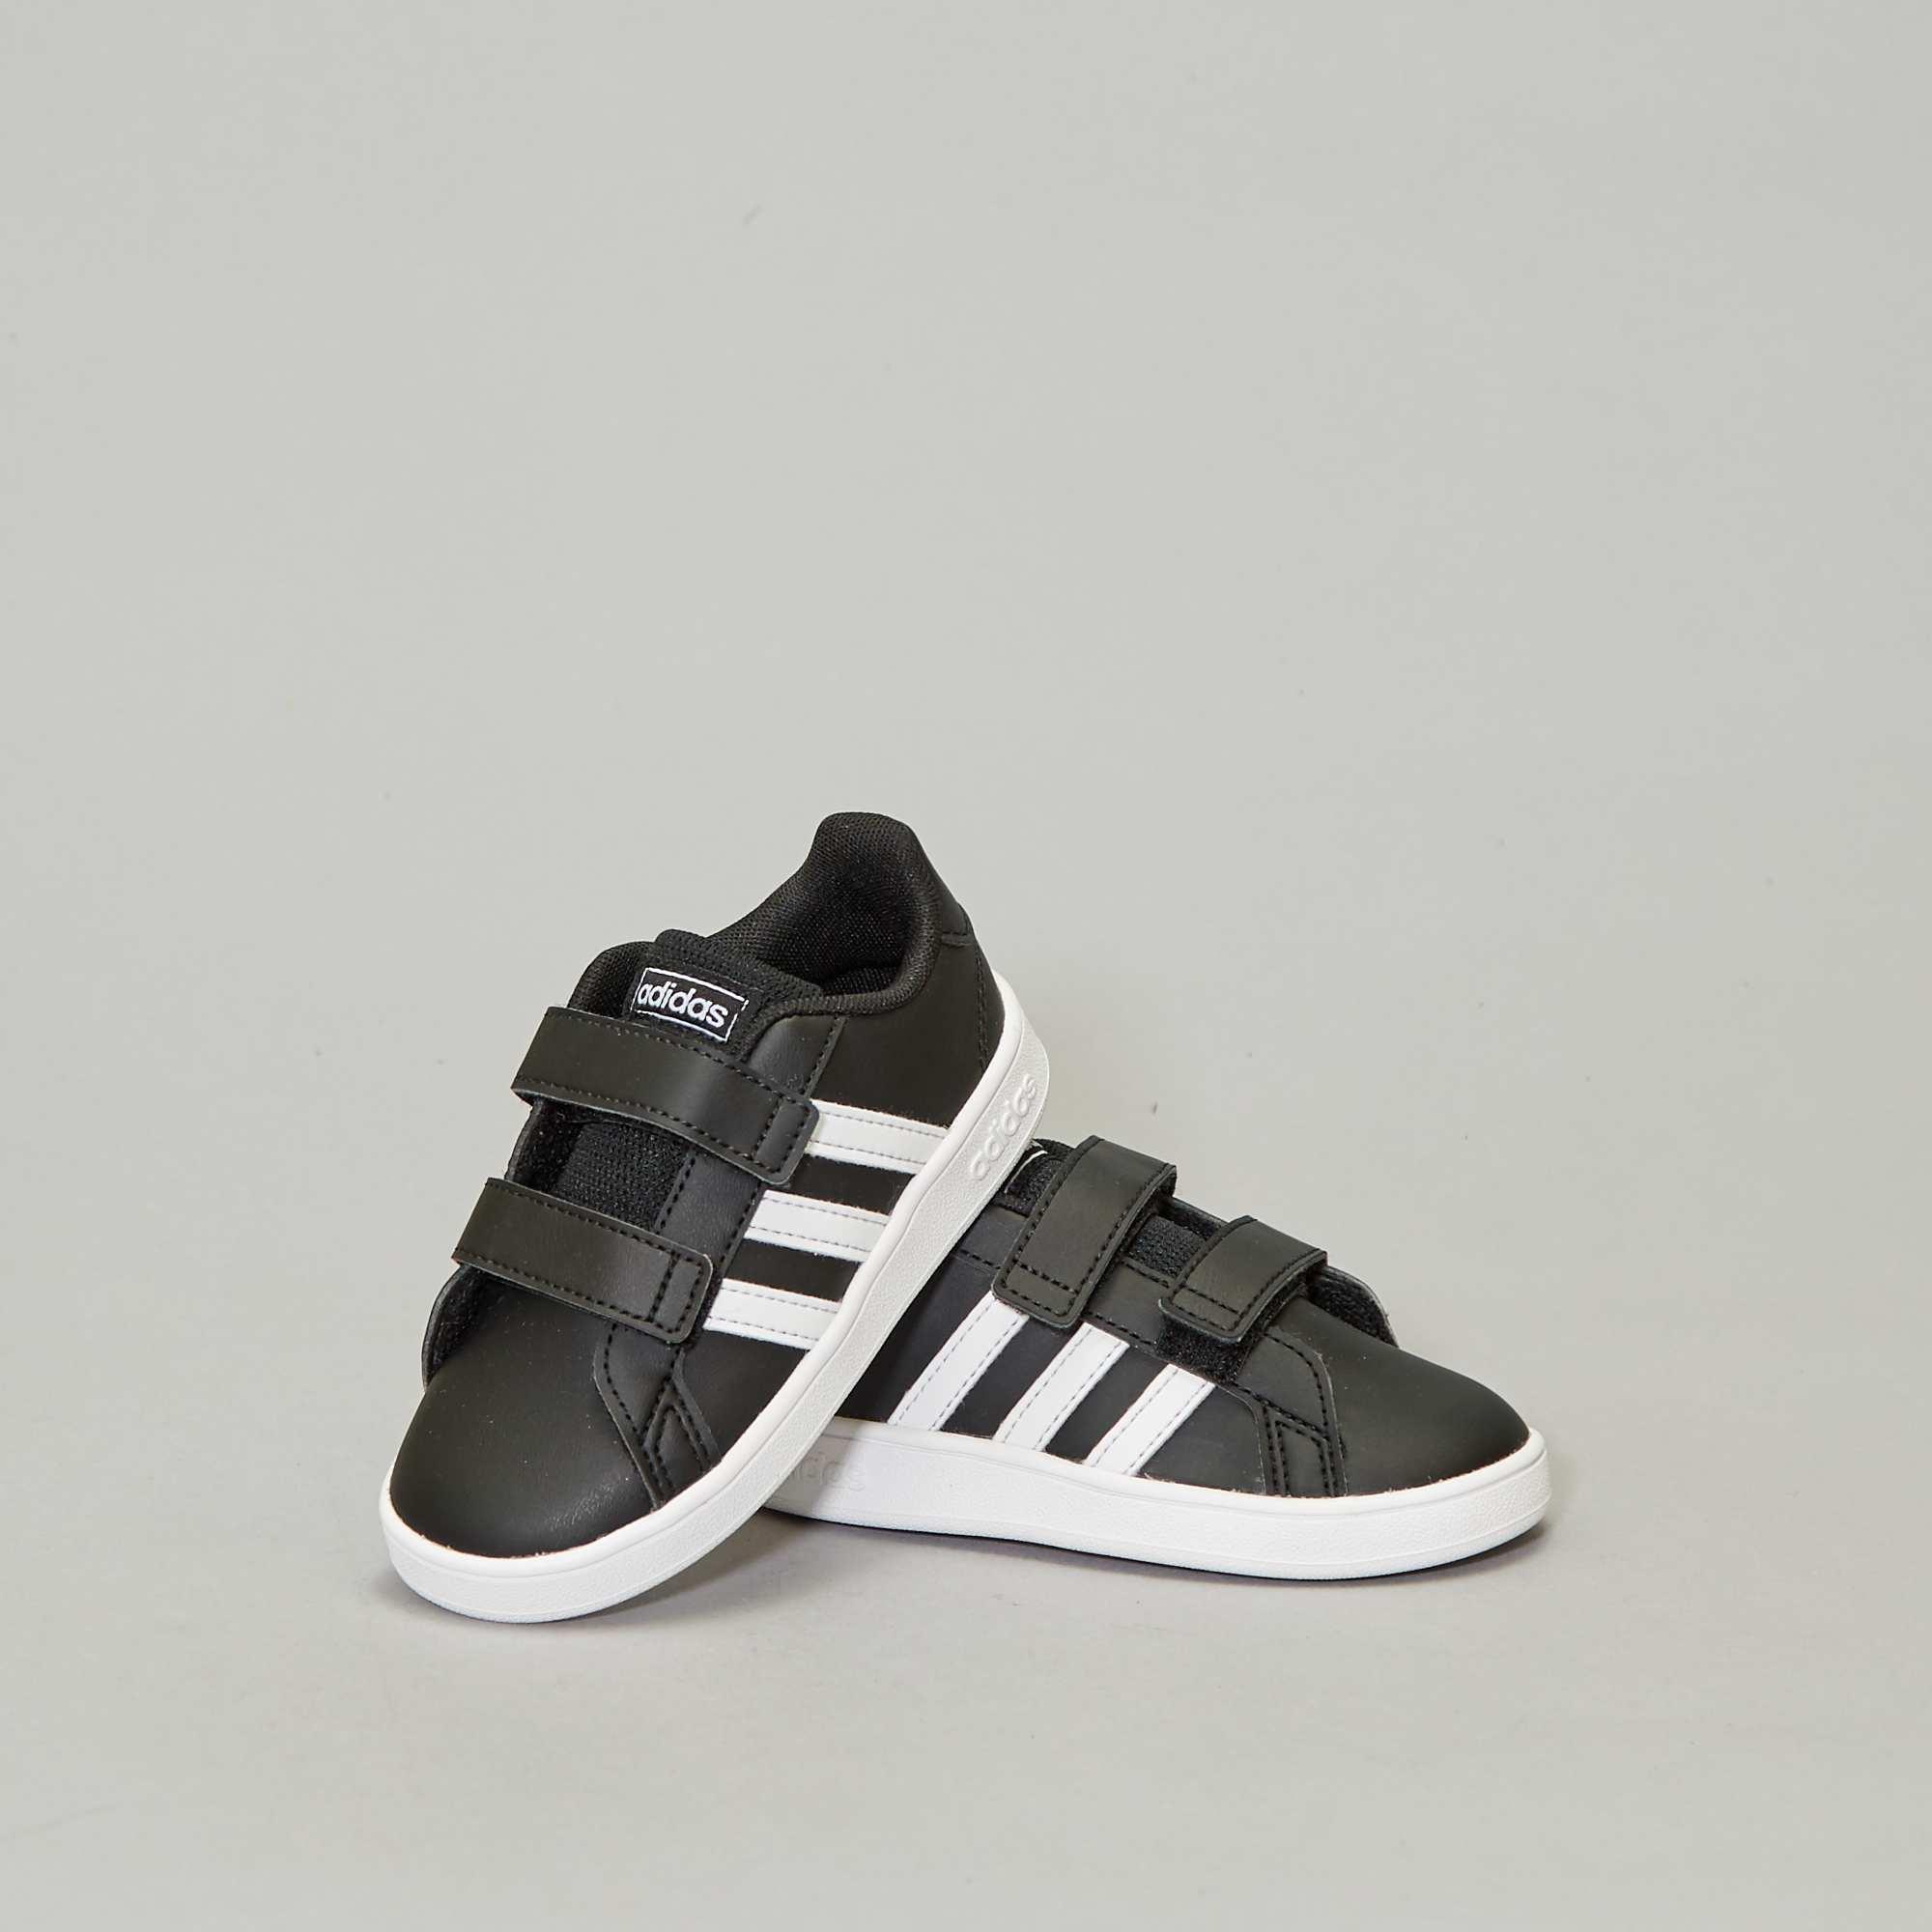 d5d6bcc1c5 Zapatillas 'Adidas Grand Court I' Chico - NEGRO - Kiabi - 30,00€